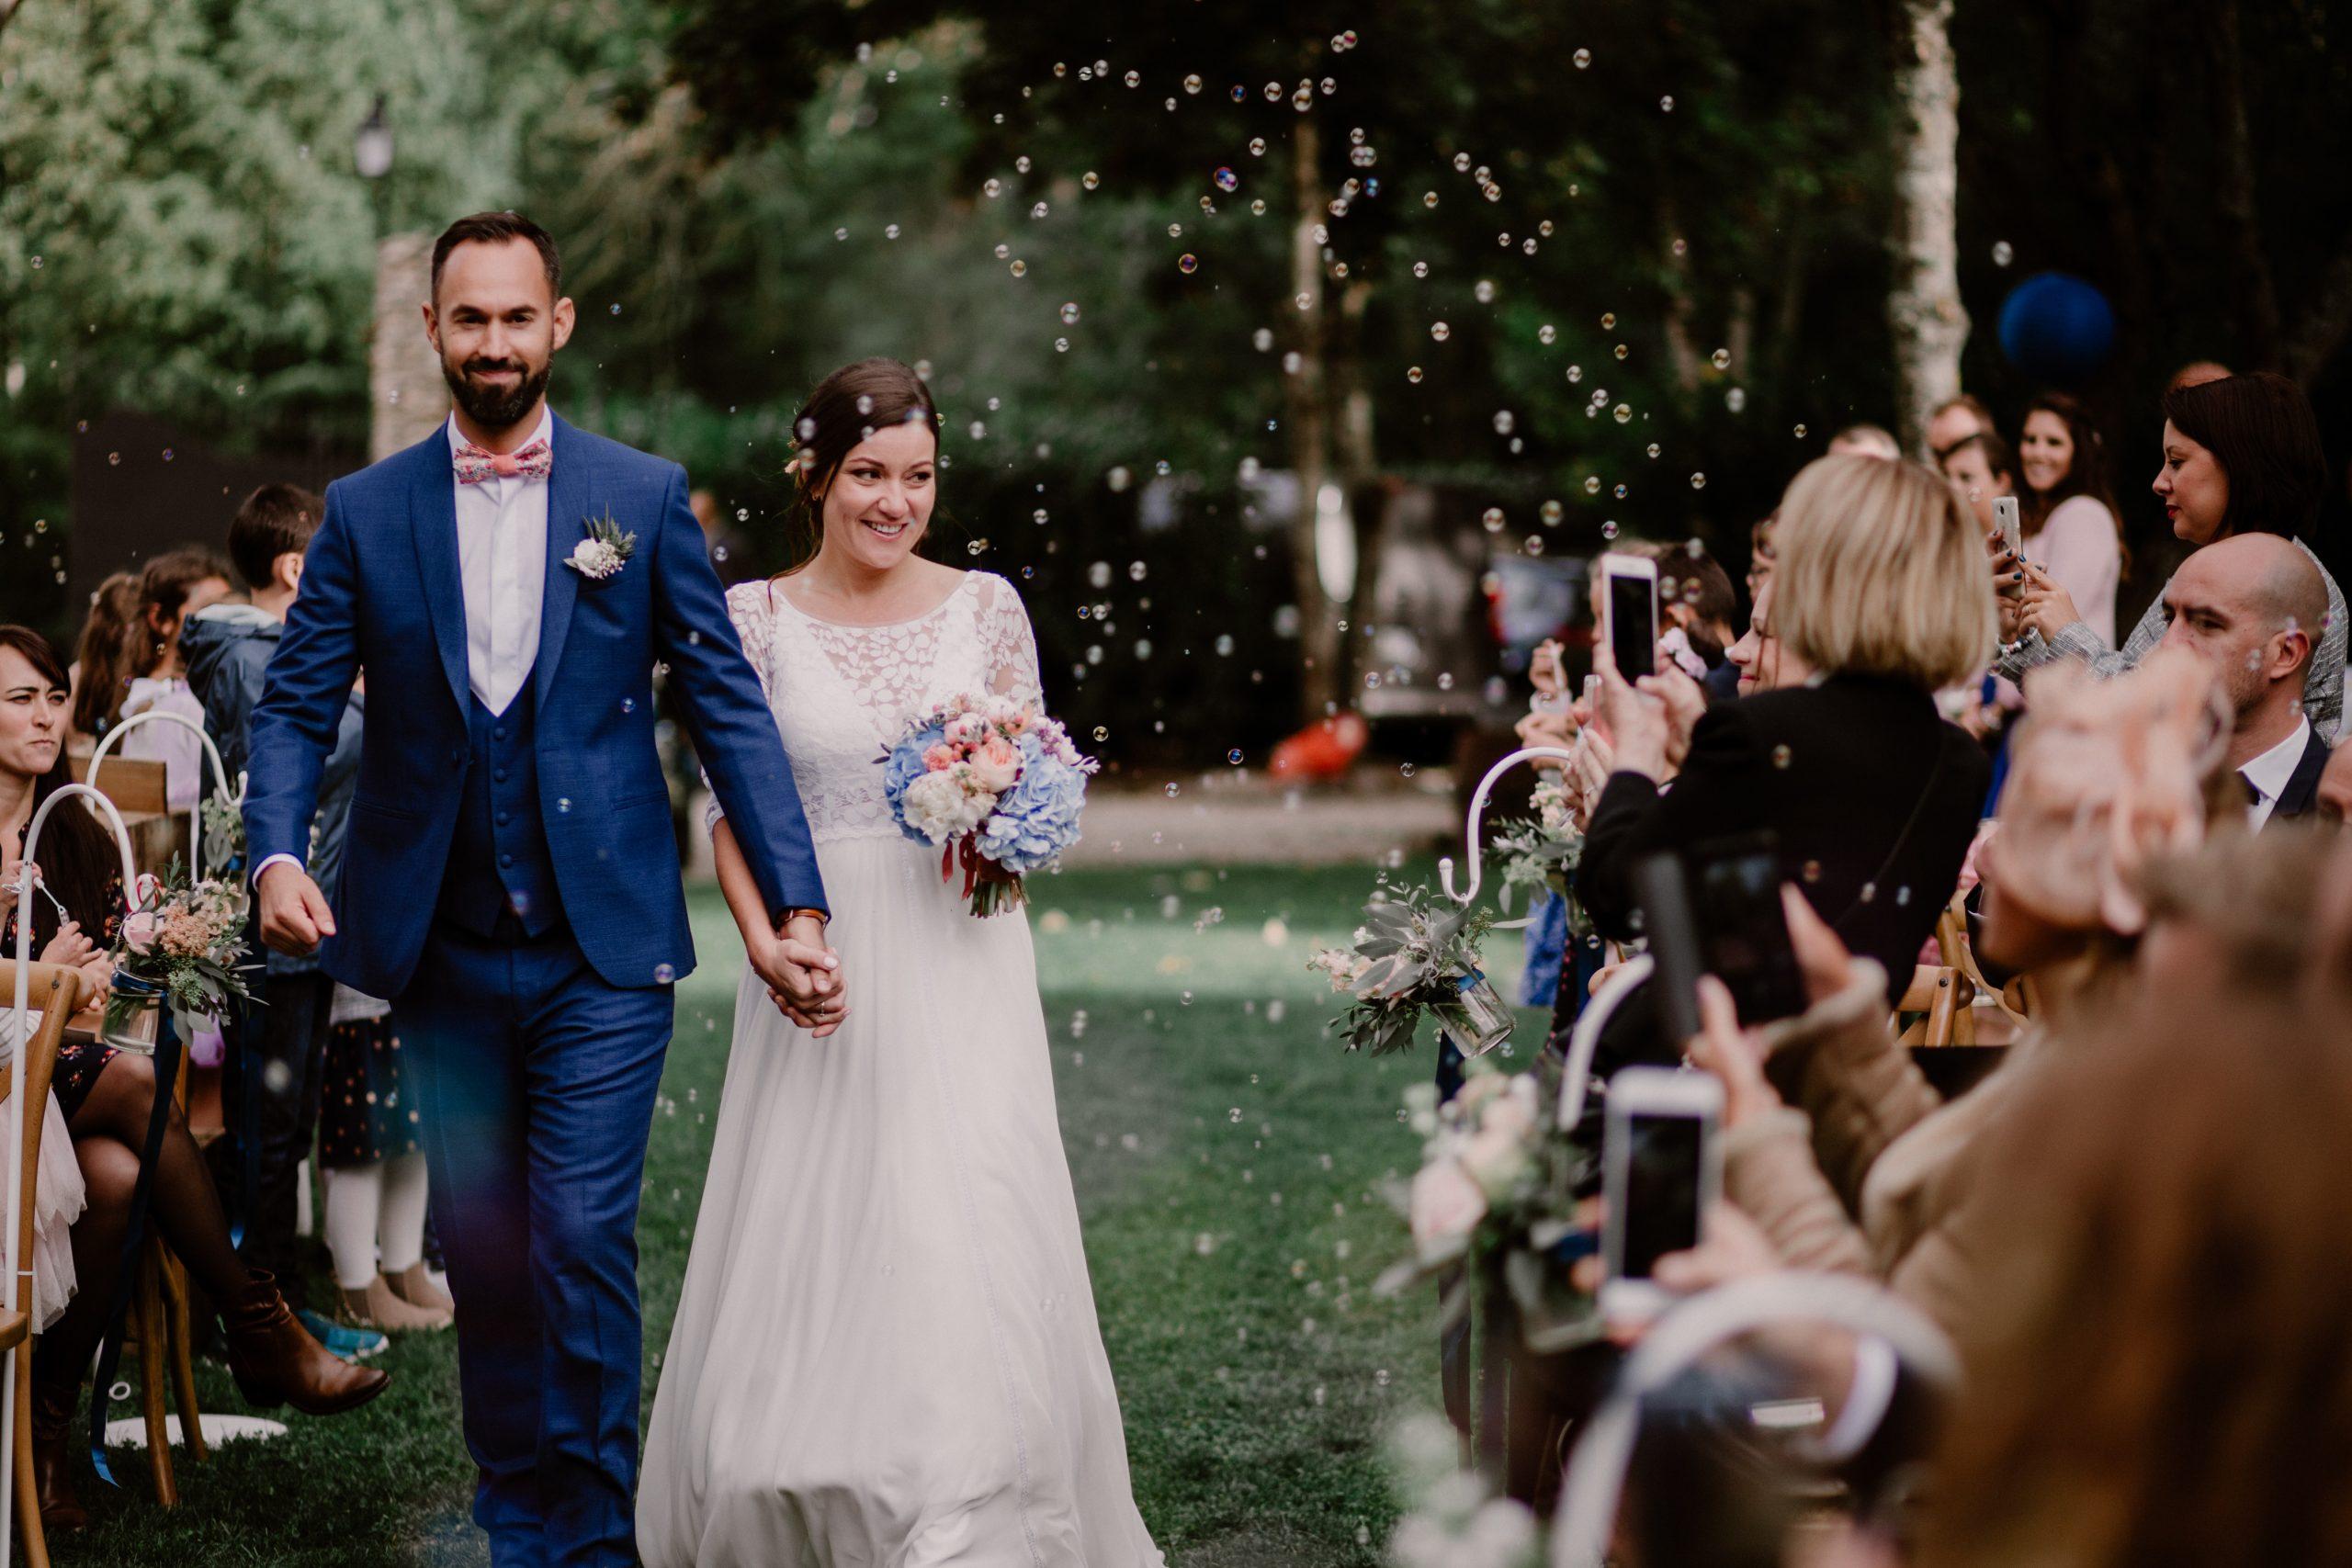 HD Mariage Aurelie Eric 272 scaled - Dagmara Bojenko - Eco-conscious Weddings, Births & Families